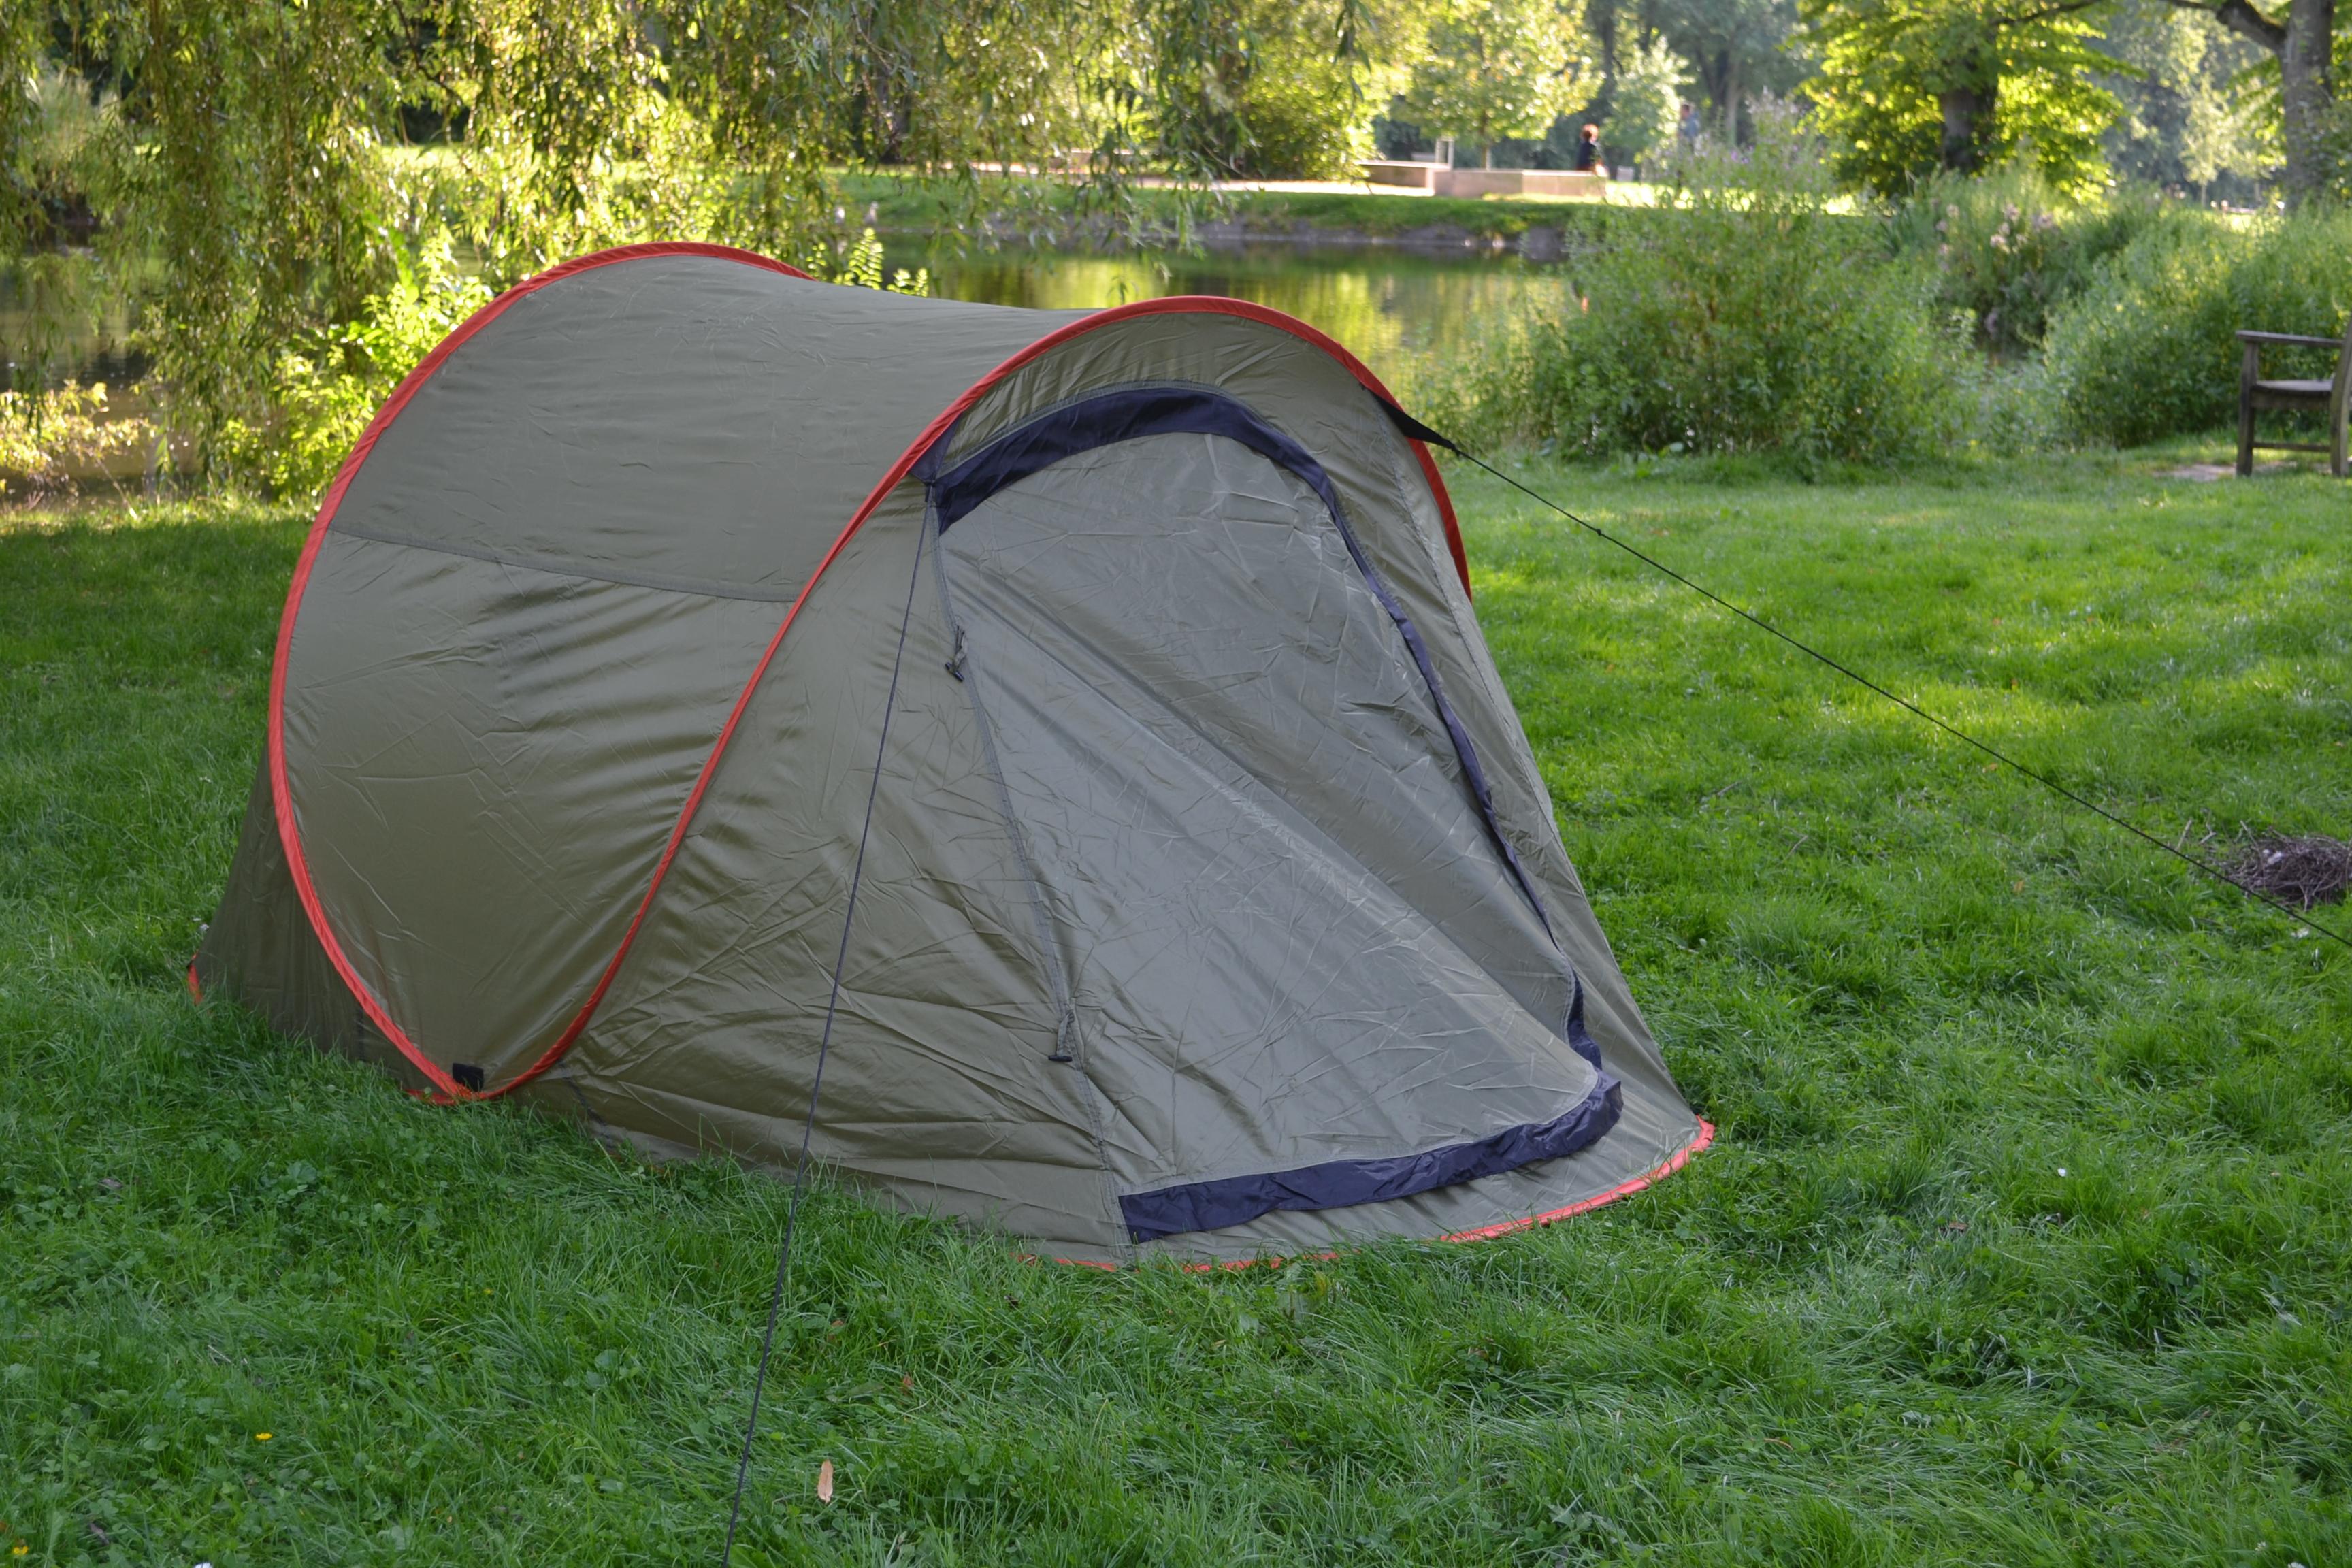 Wurfzelt Sekundenzelt 2-3 Person Outdoor Campingzelt Tent Pop Up 245x145x110cm GRÜN